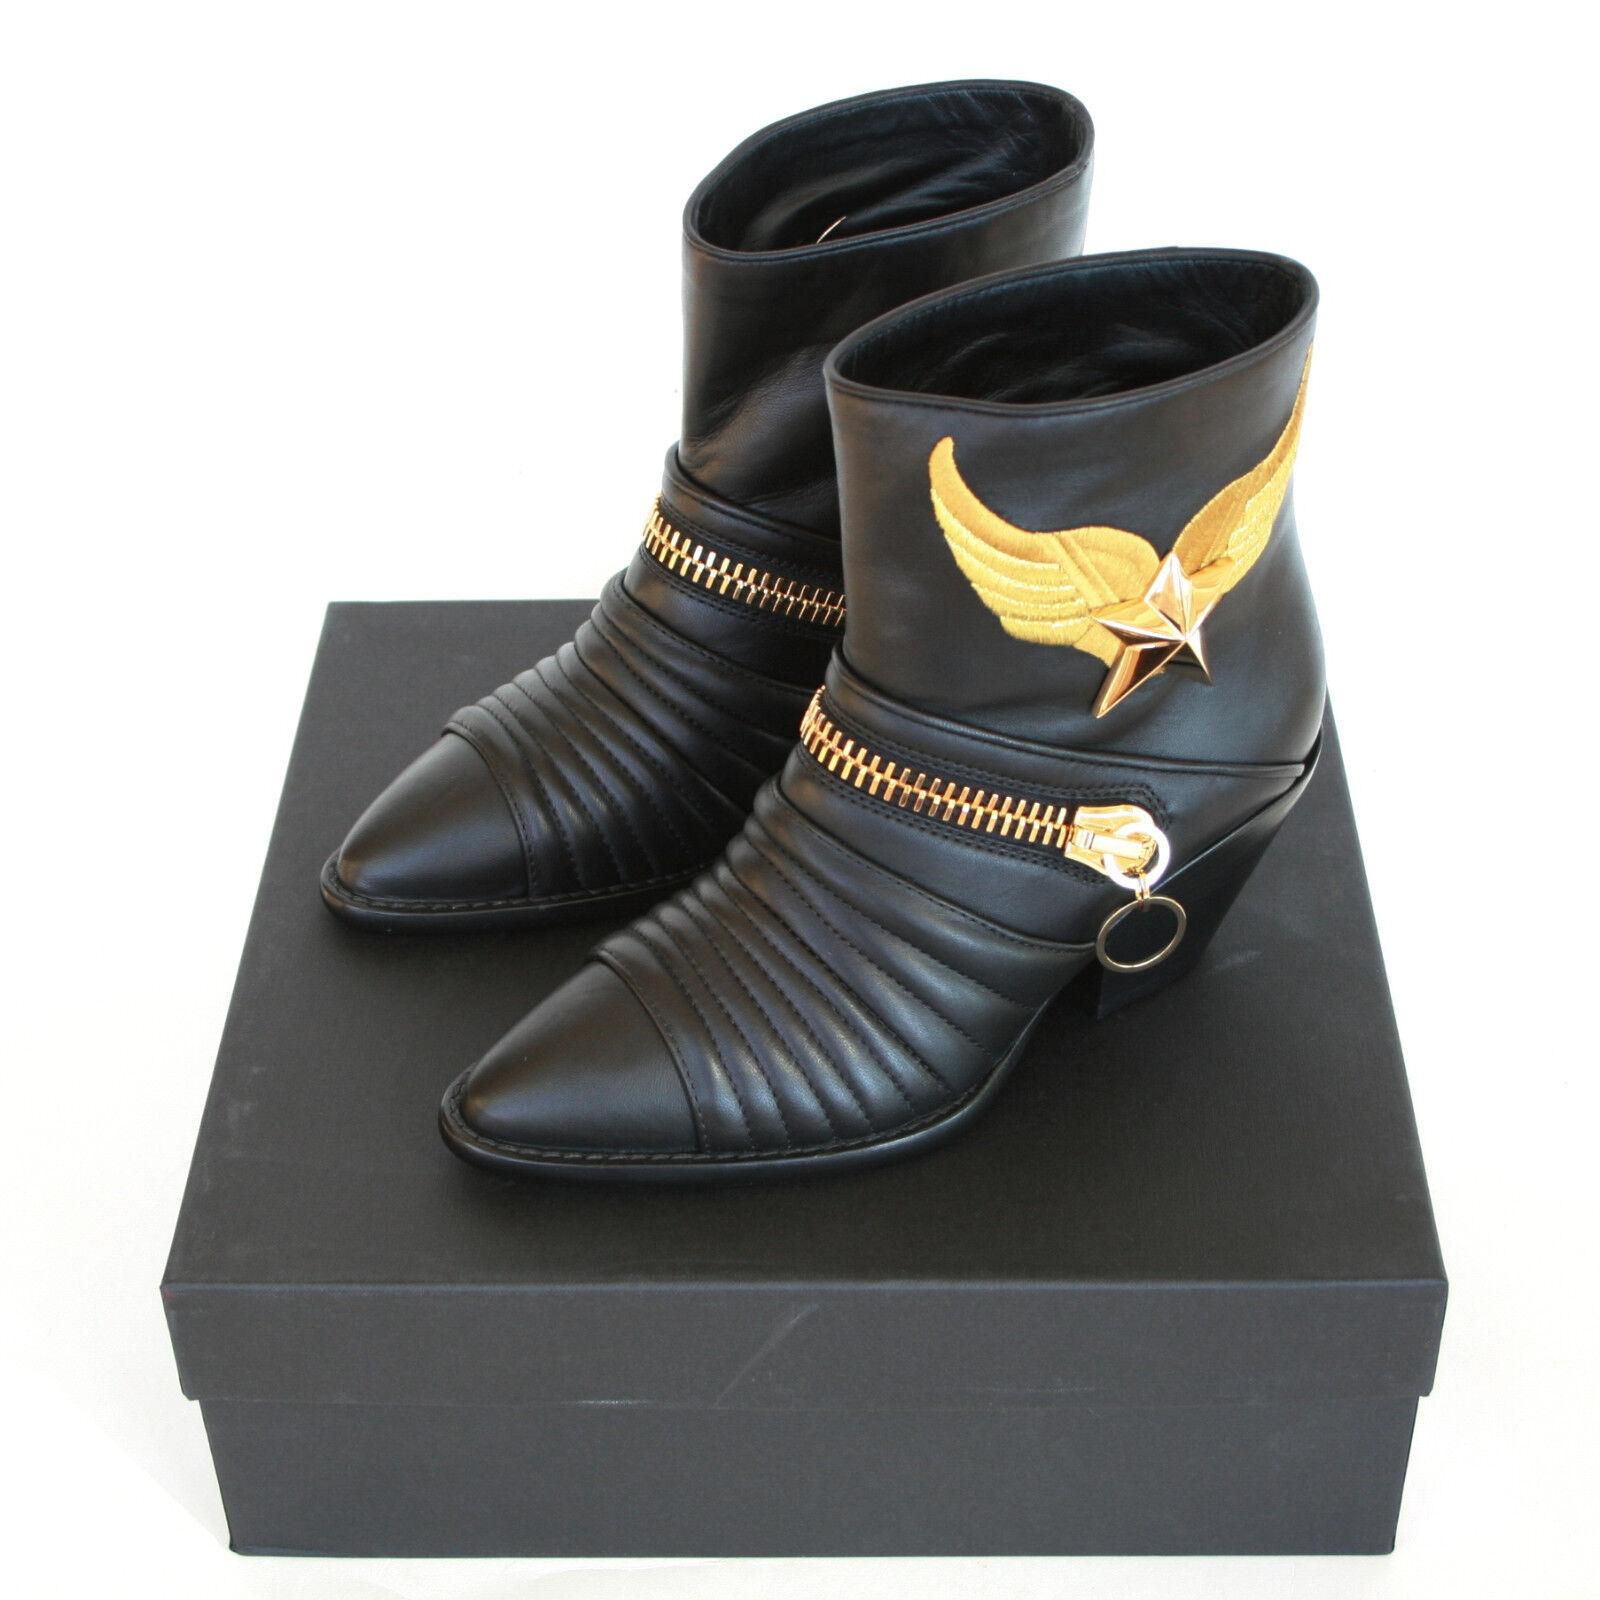 Giuseppe Zanotti 1,938 oro metal con alas estrella Botas 38.5 Con Cremallera Tacón Cubano 38.5 Botas Nuevo df52f2